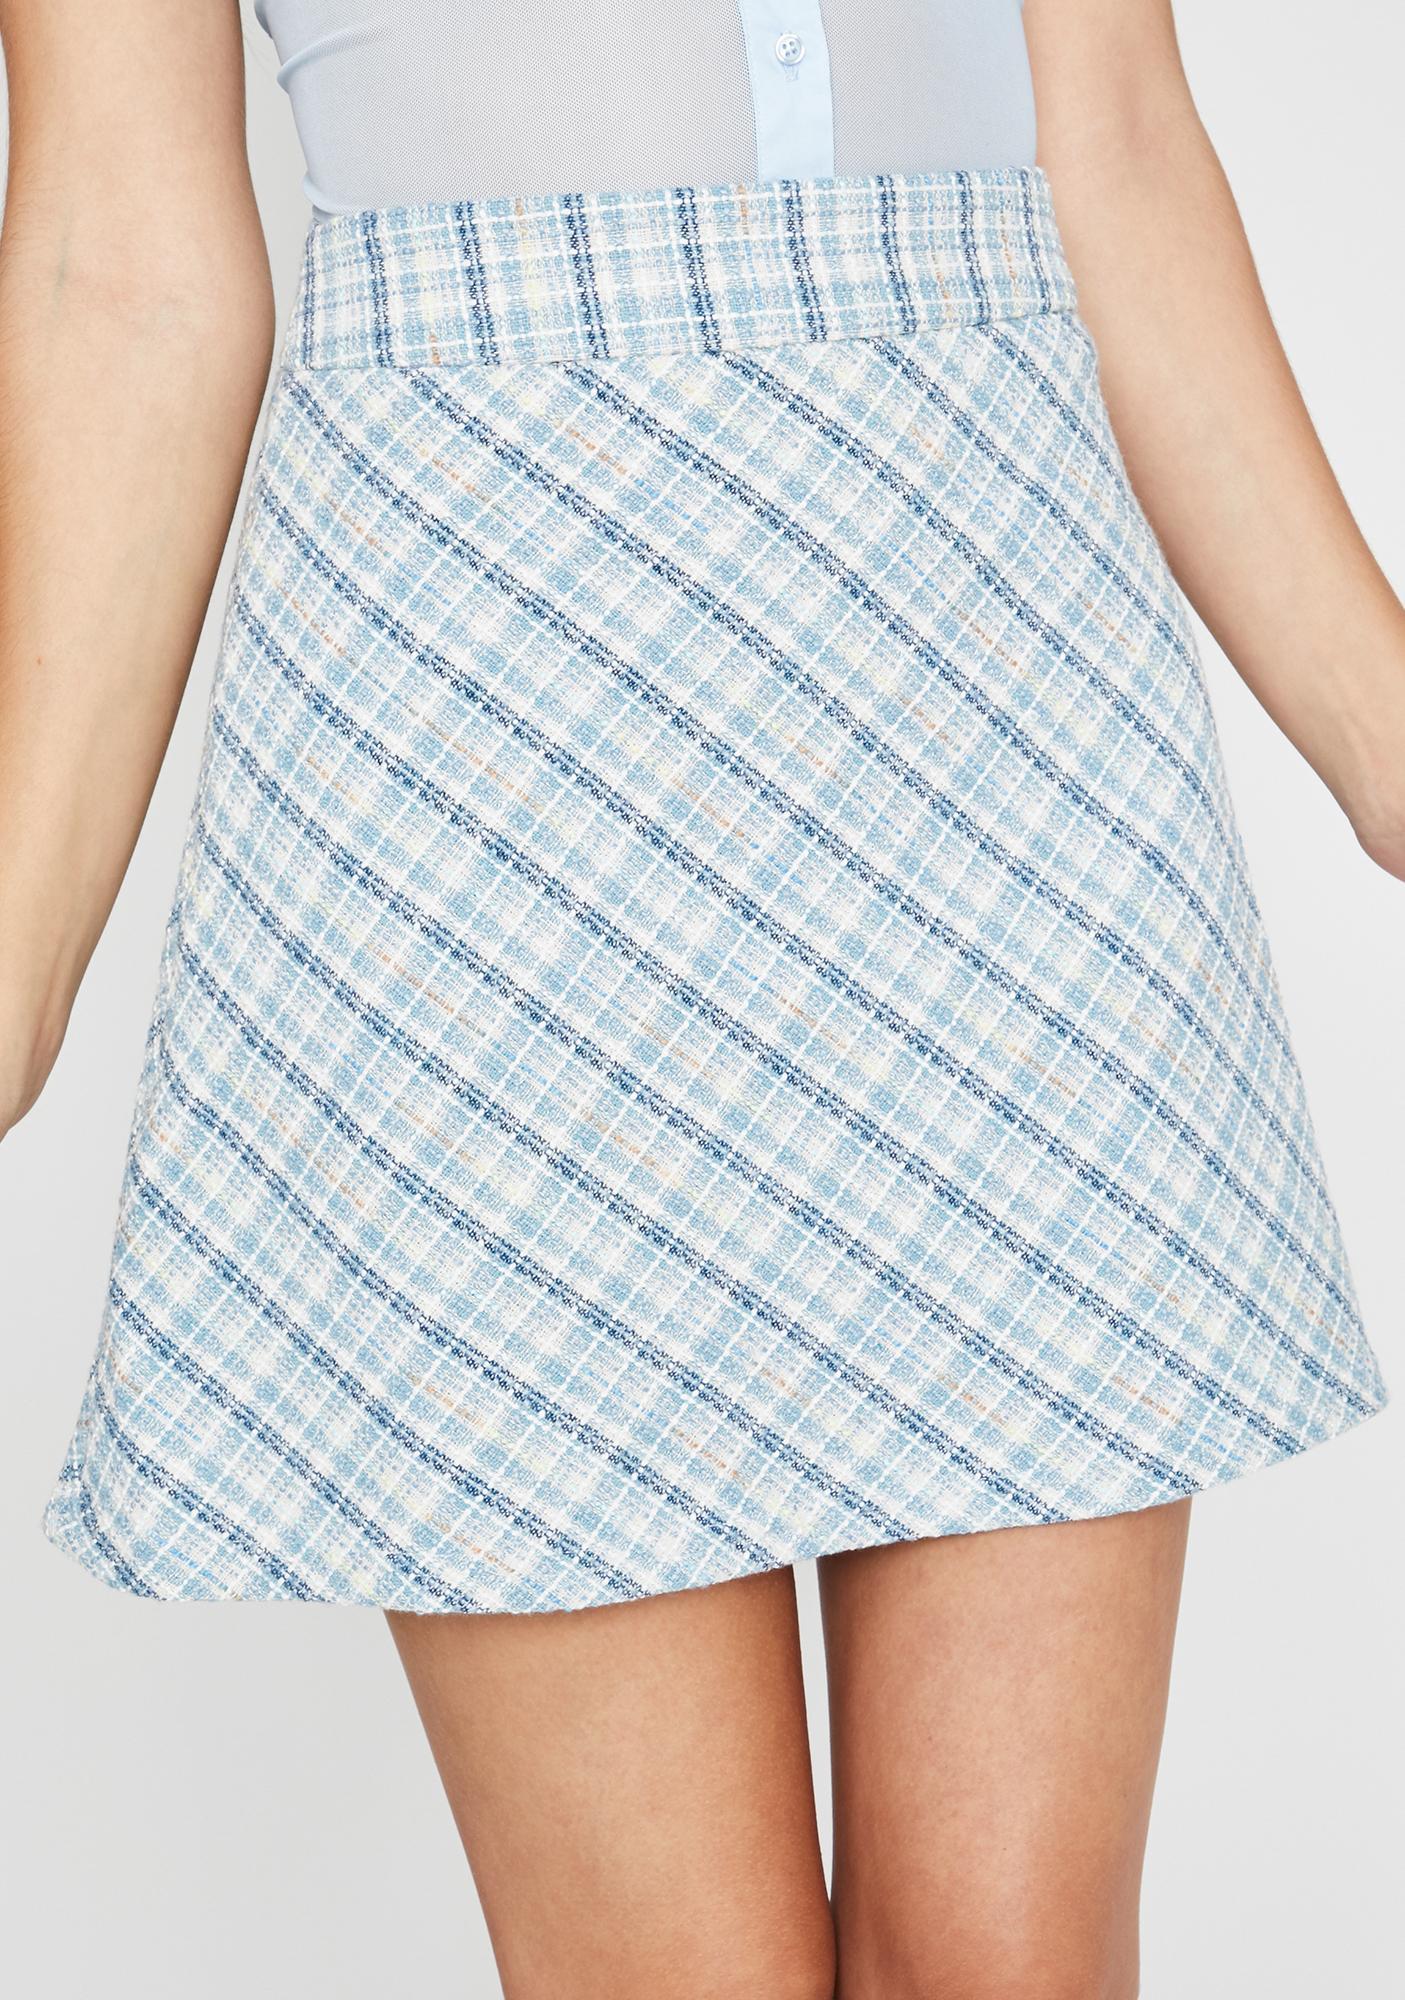 Sugar Thrillz We're Going Shopping Mini Skirt